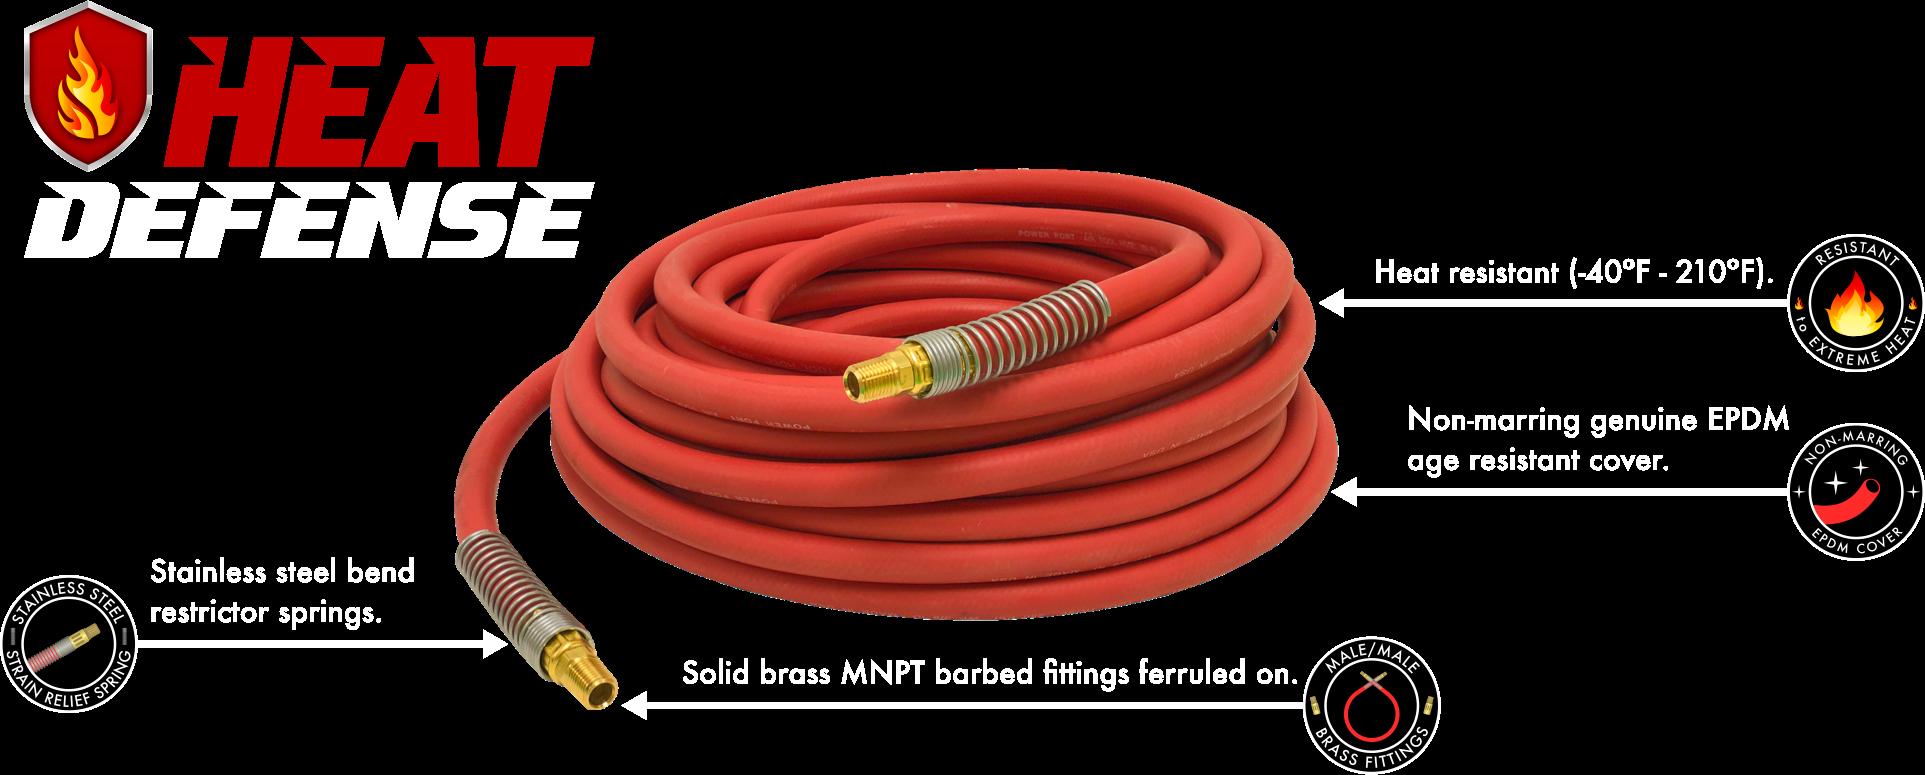 Heat Defense Rubber Air Hose